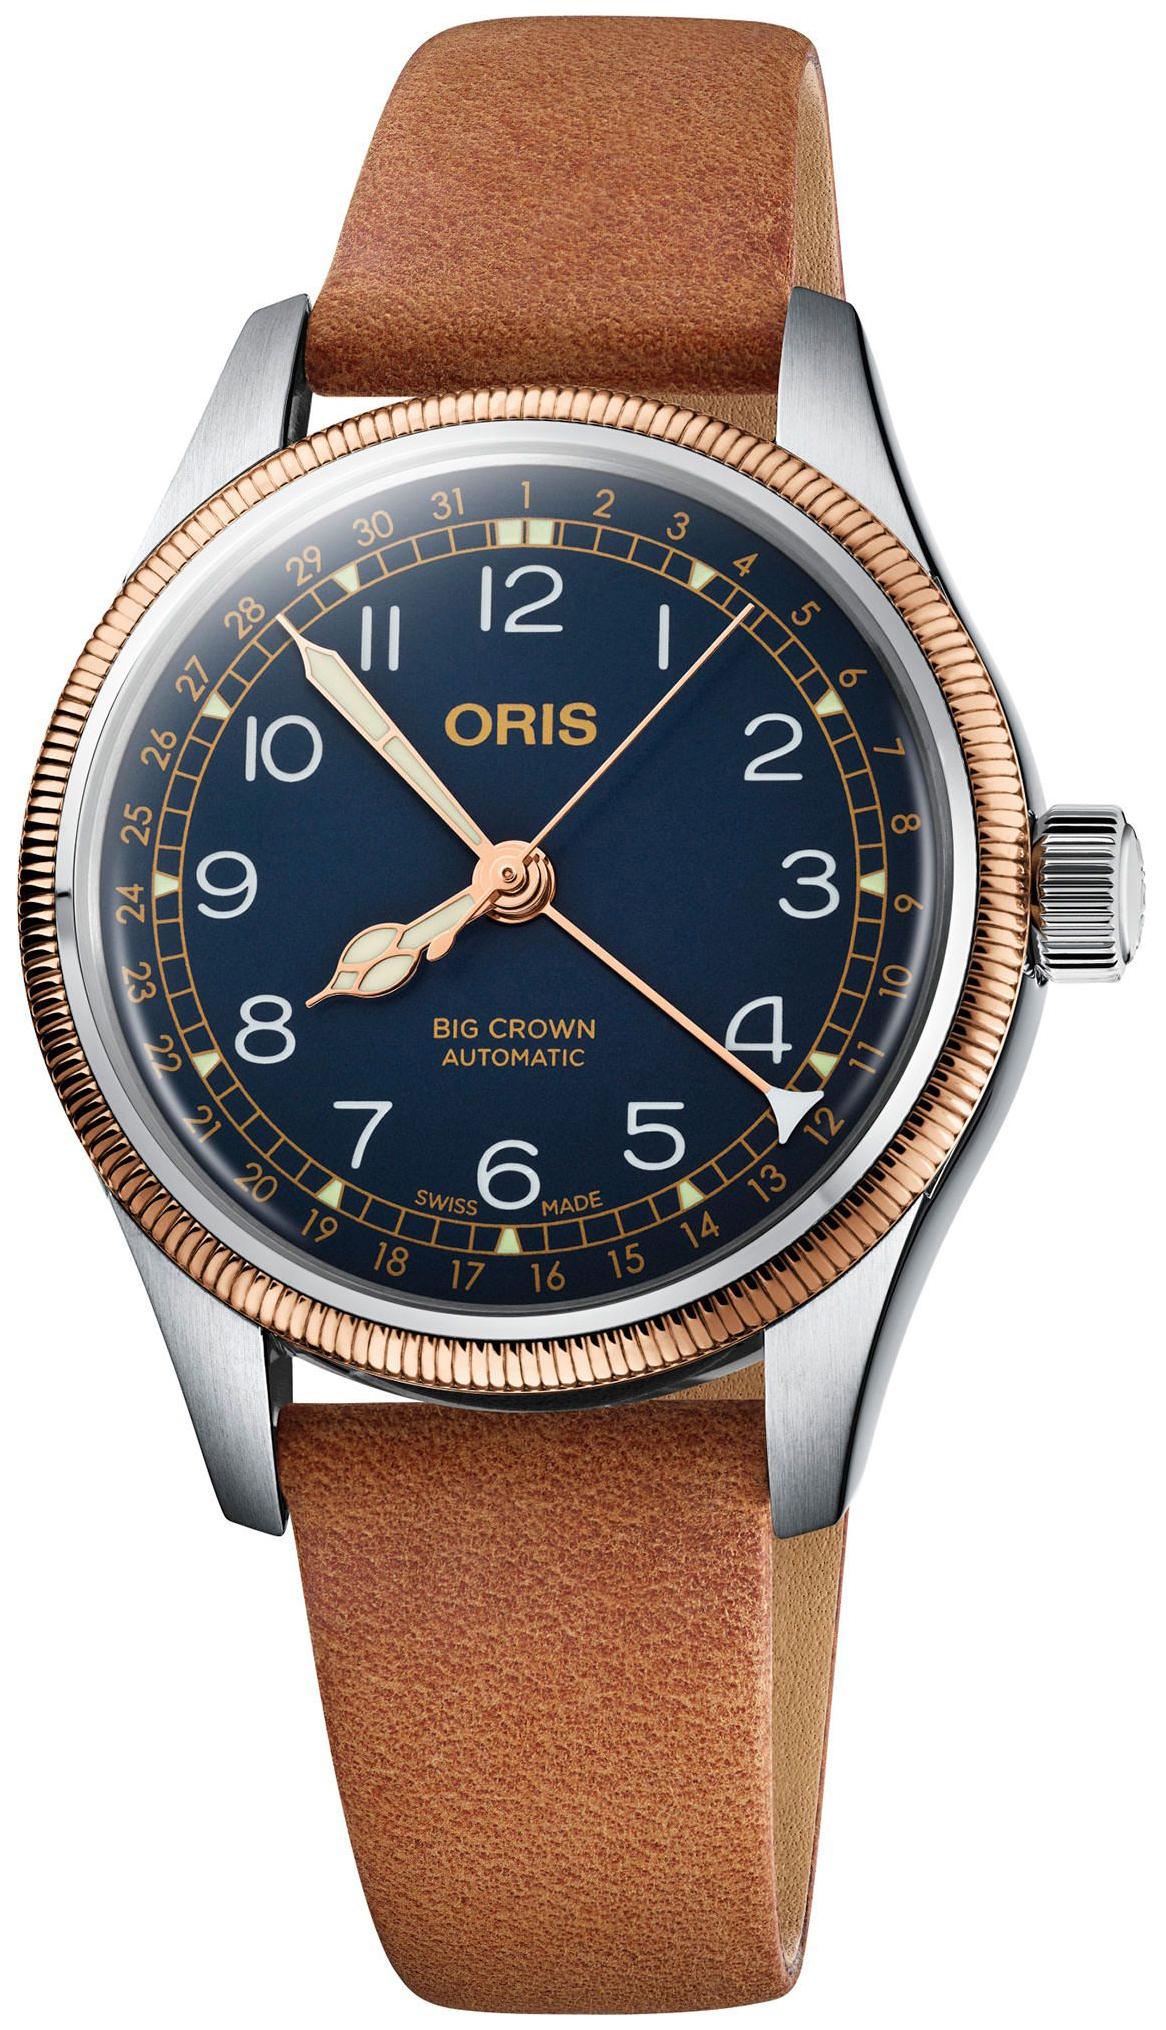 Oris Aviation Dameklokke 01 754 7749 4365-07 5 17 66 Blå/Lær Ø36 mm - Oris